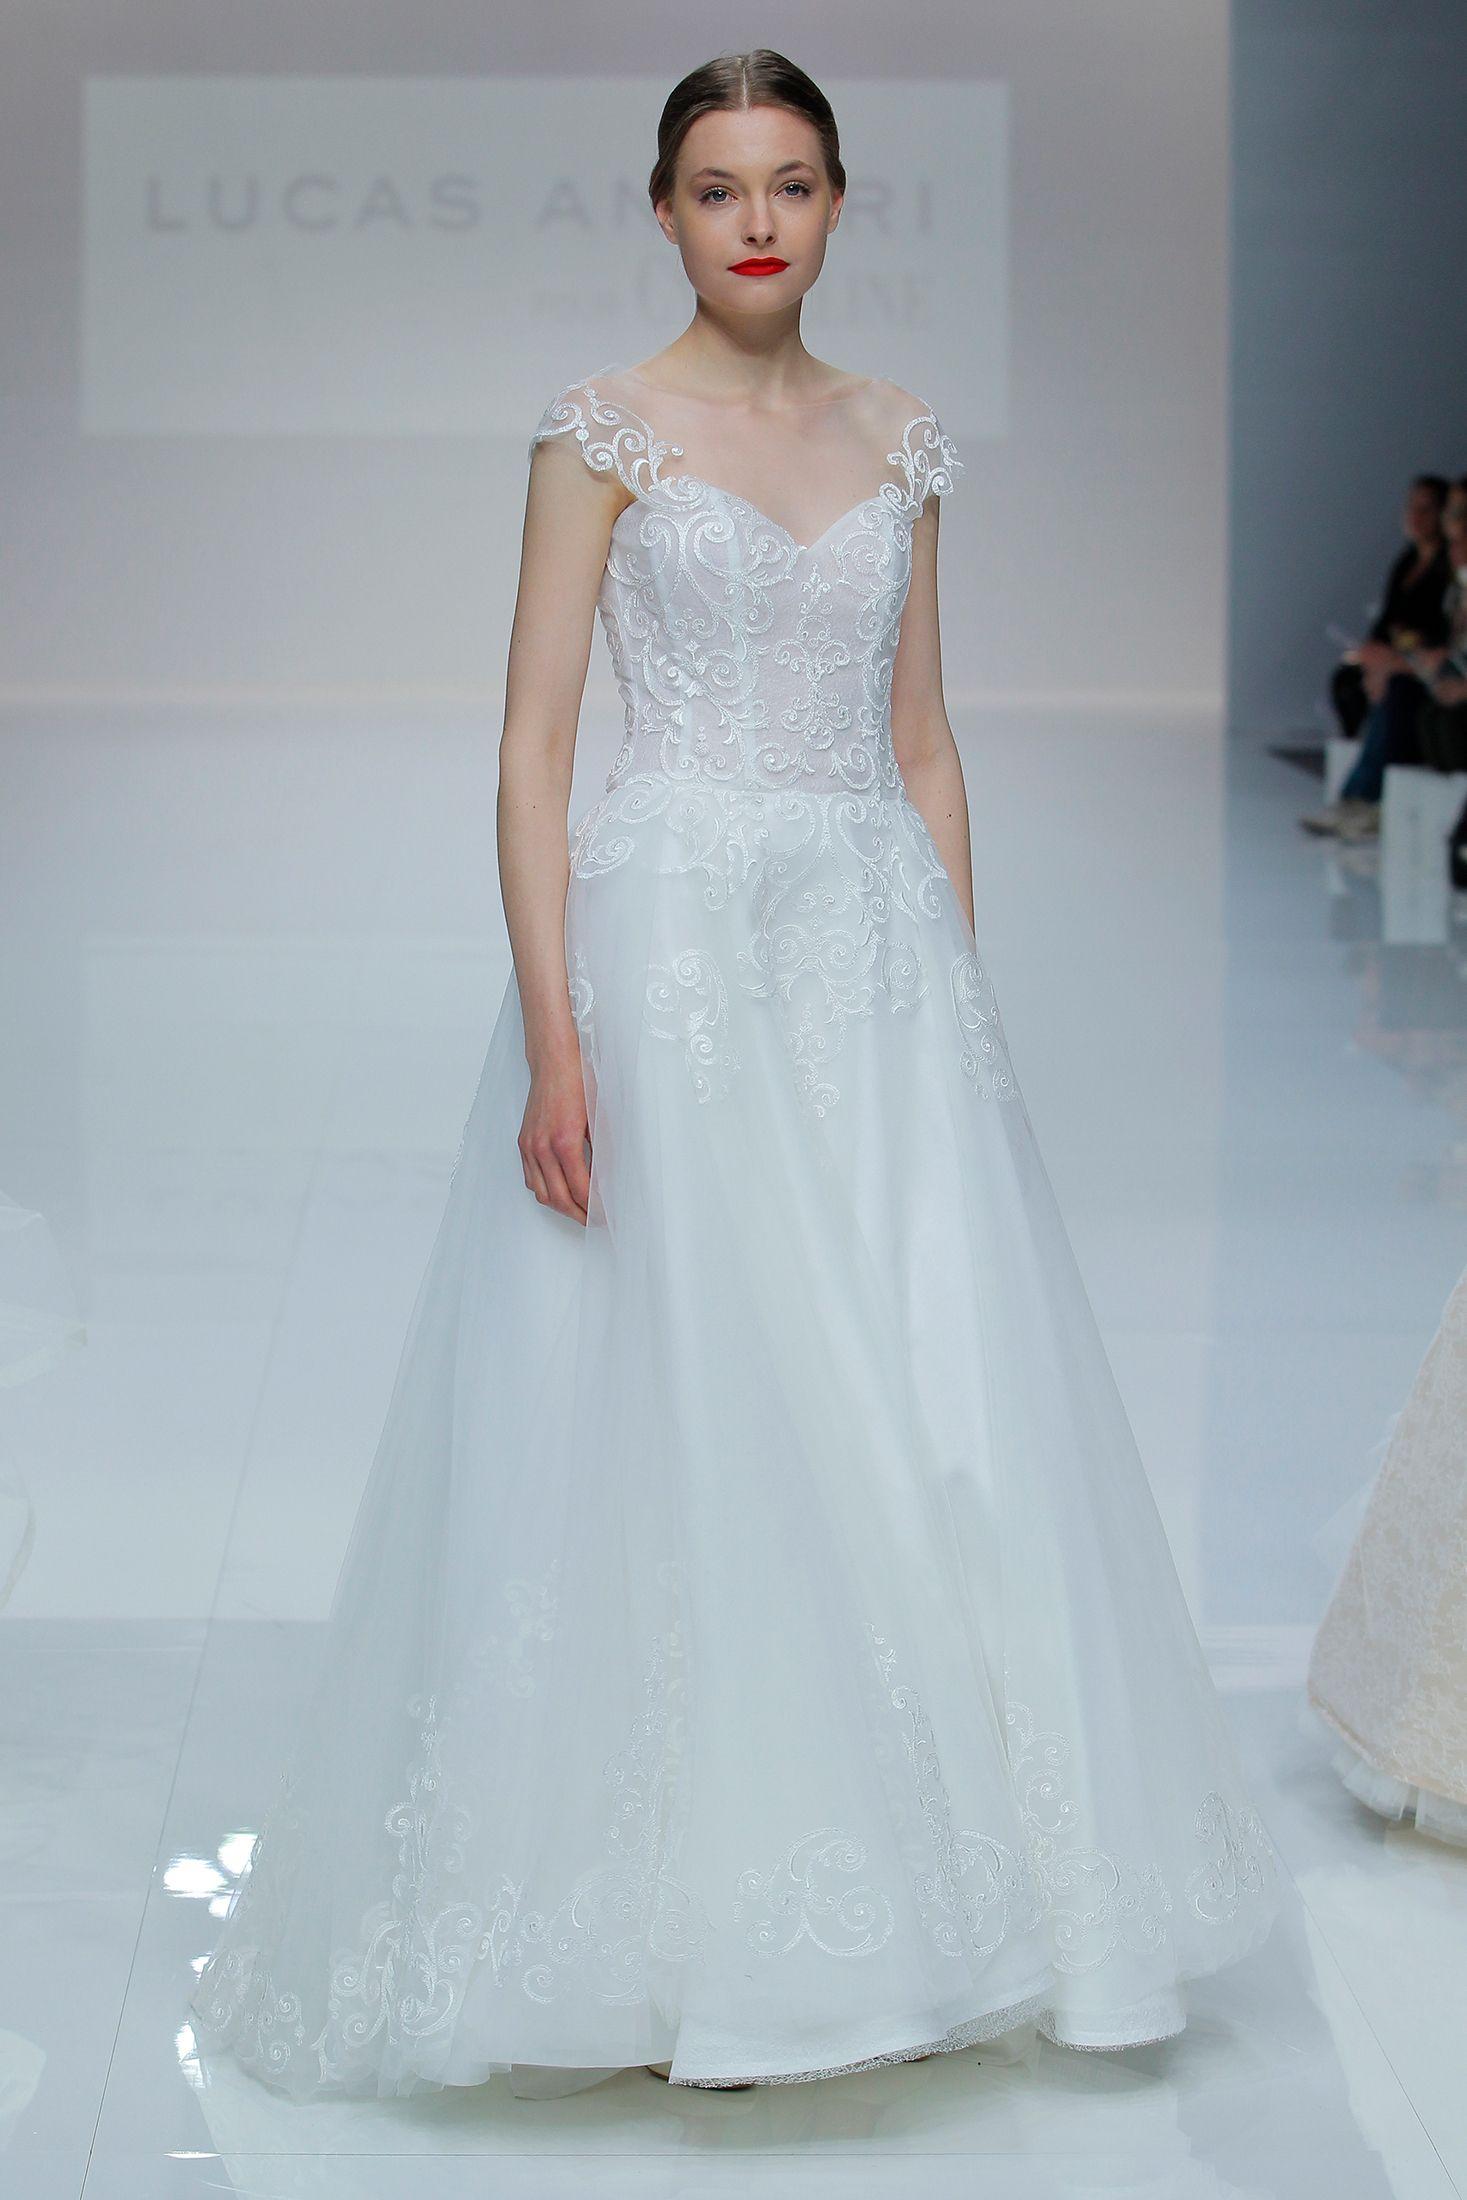 Beautiful Vestidos Novia Luna Picture Collection - All Wedding ...